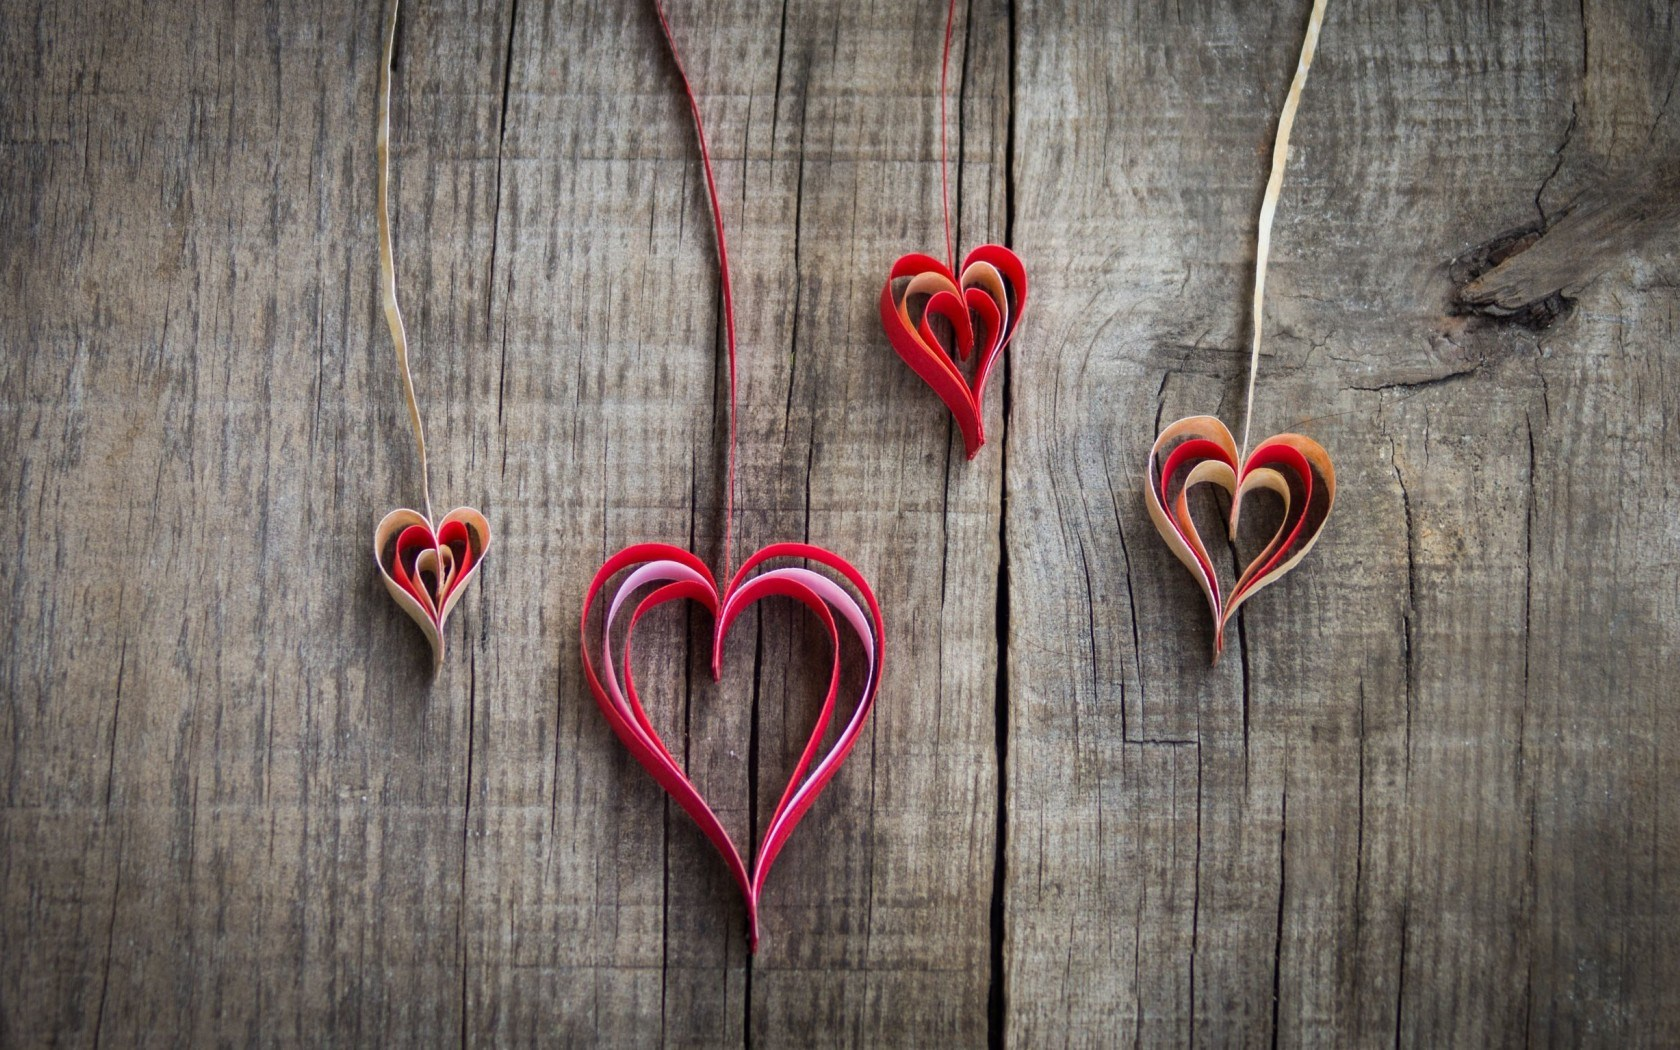 Romantic-Love-Heart-Shaped-Wallpaper For Window